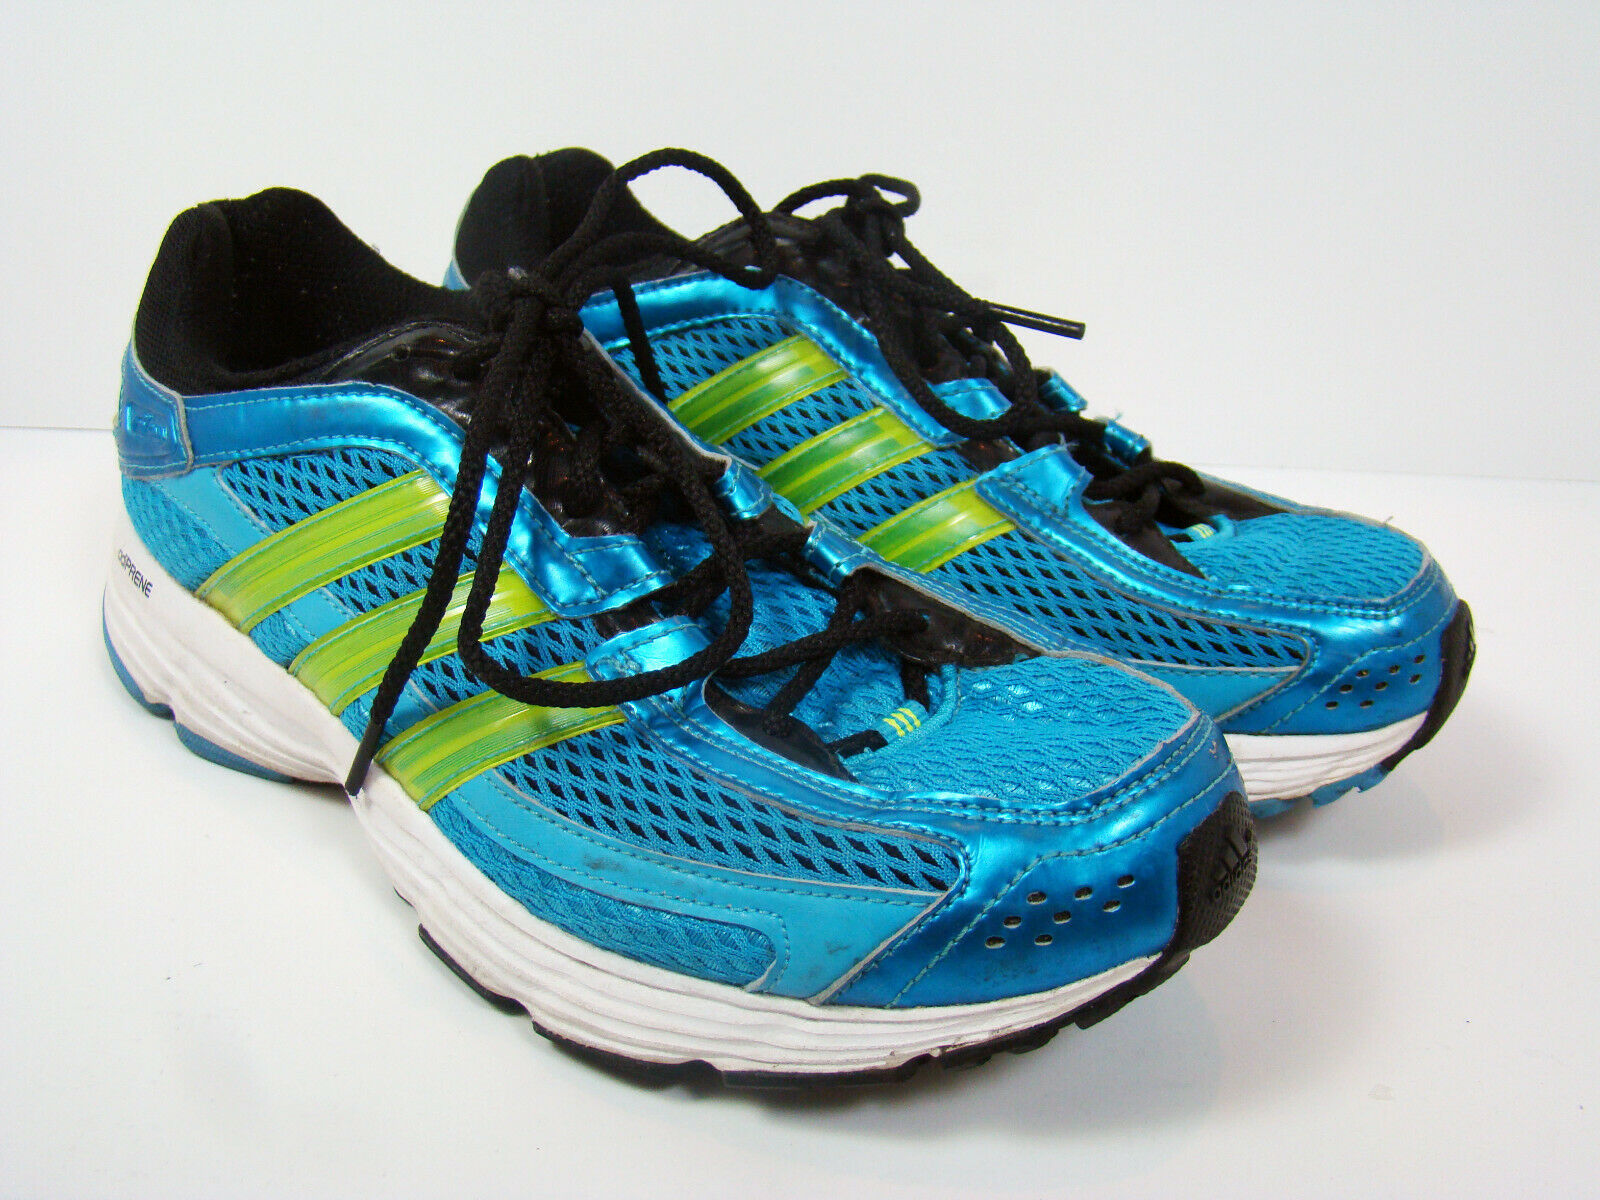 Adidas Falcon Adiprene Women's Tennis Running Shoes Teal Neon US Size 7